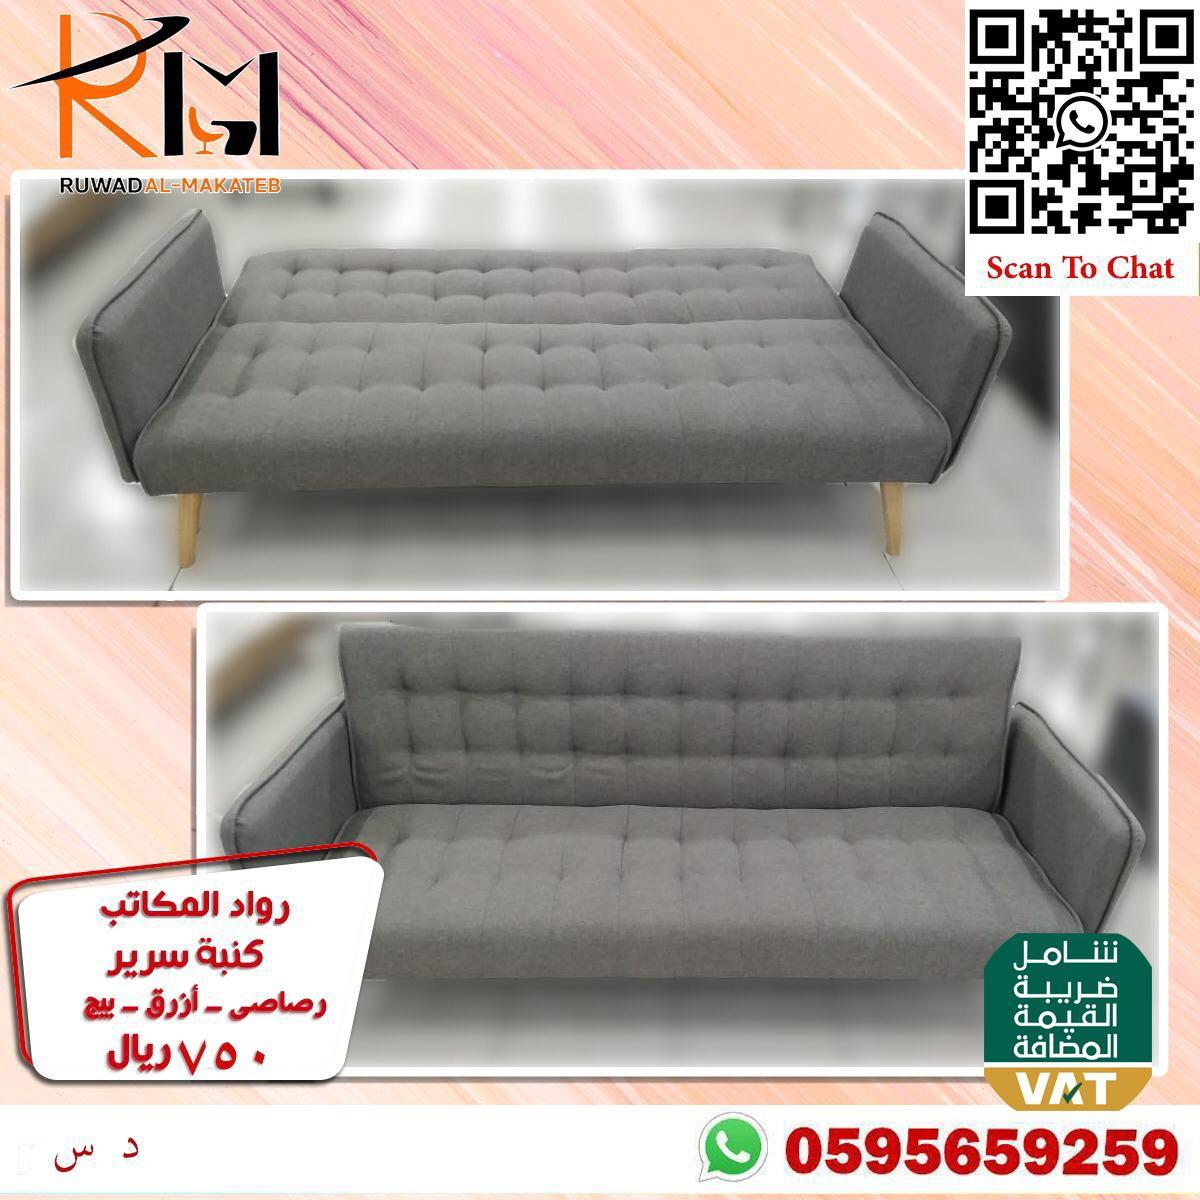 كنب سرير رمادي In 2021 Sofa Furniture Home Decor